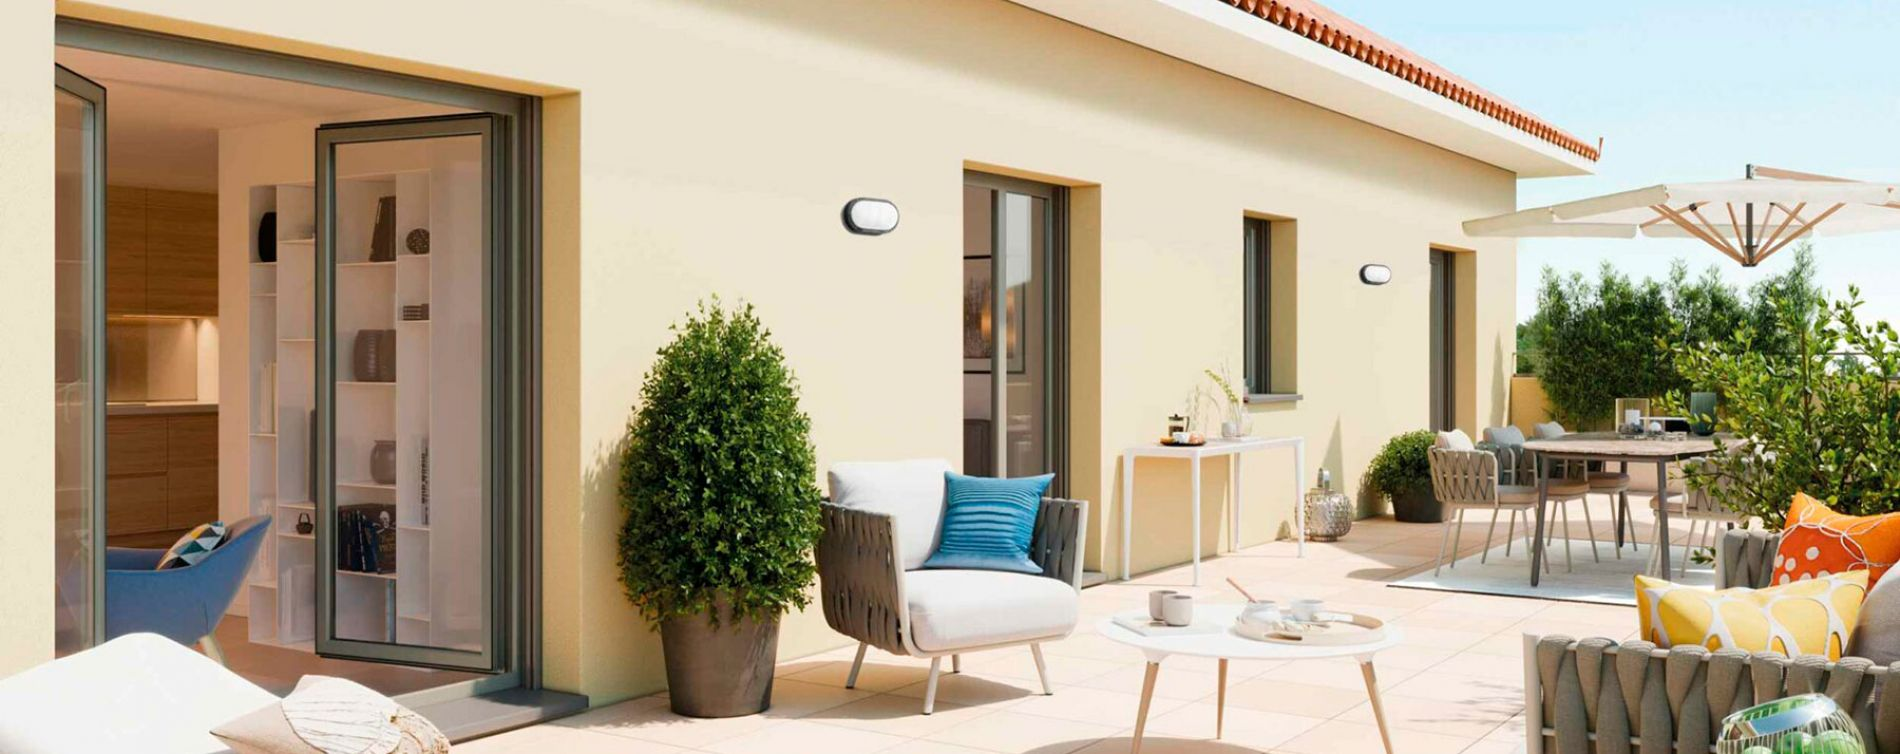 Résidence Villa Garance à Castanet-Tolosan